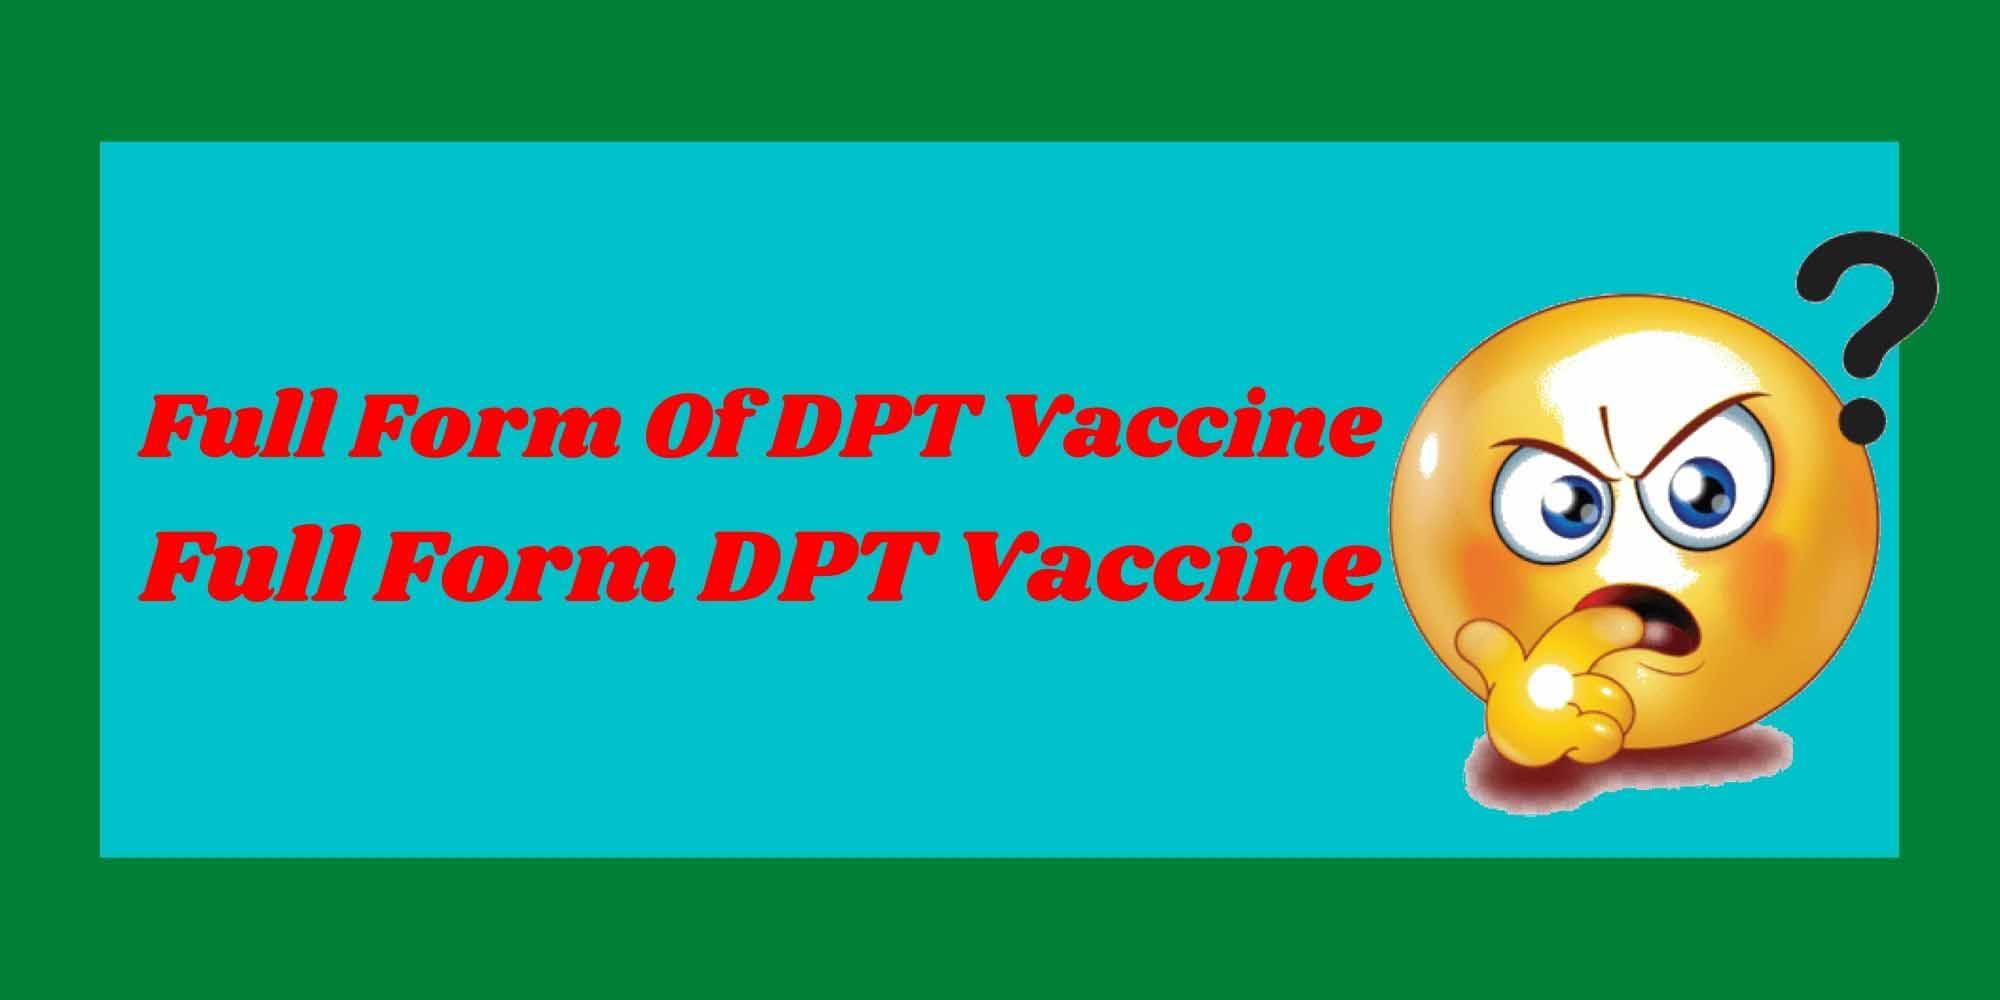 Full Form Of DPT Vaccine